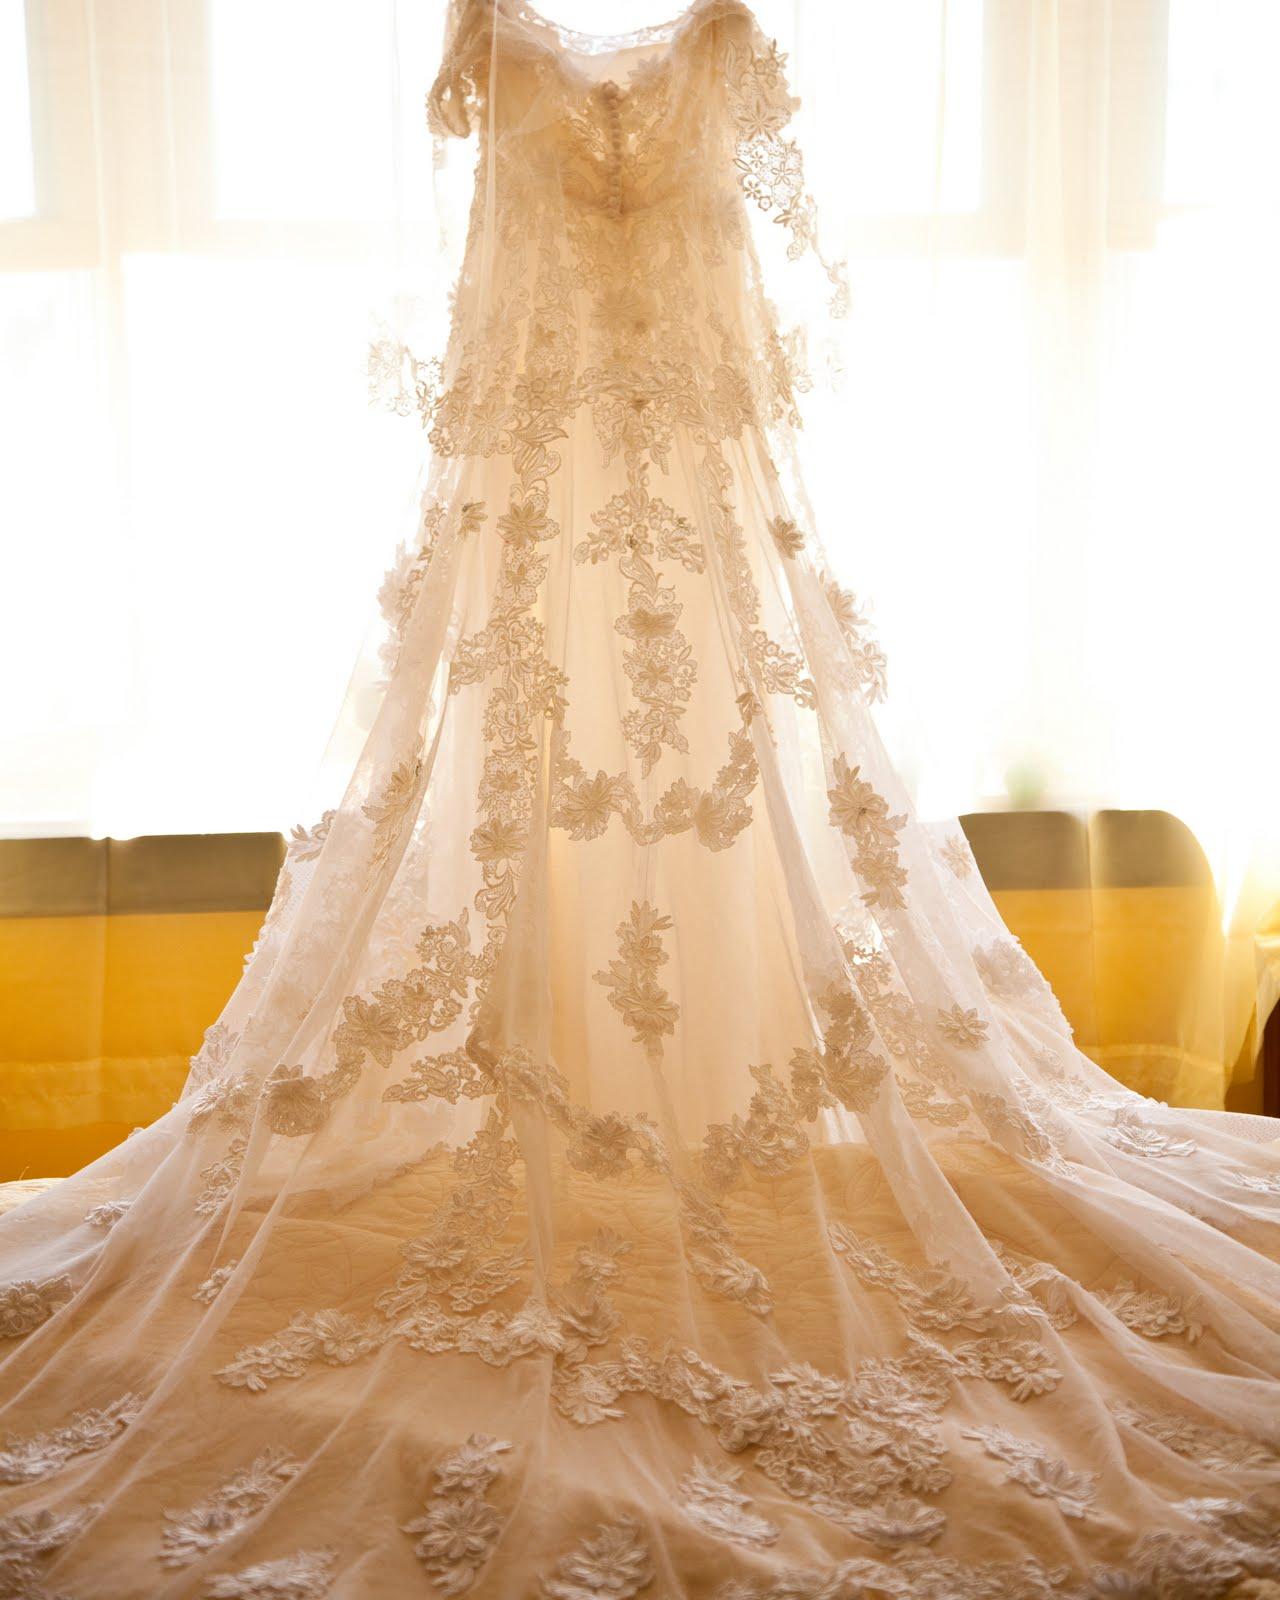 SW Photography Quincy MA Wedding Photographer Priscilla